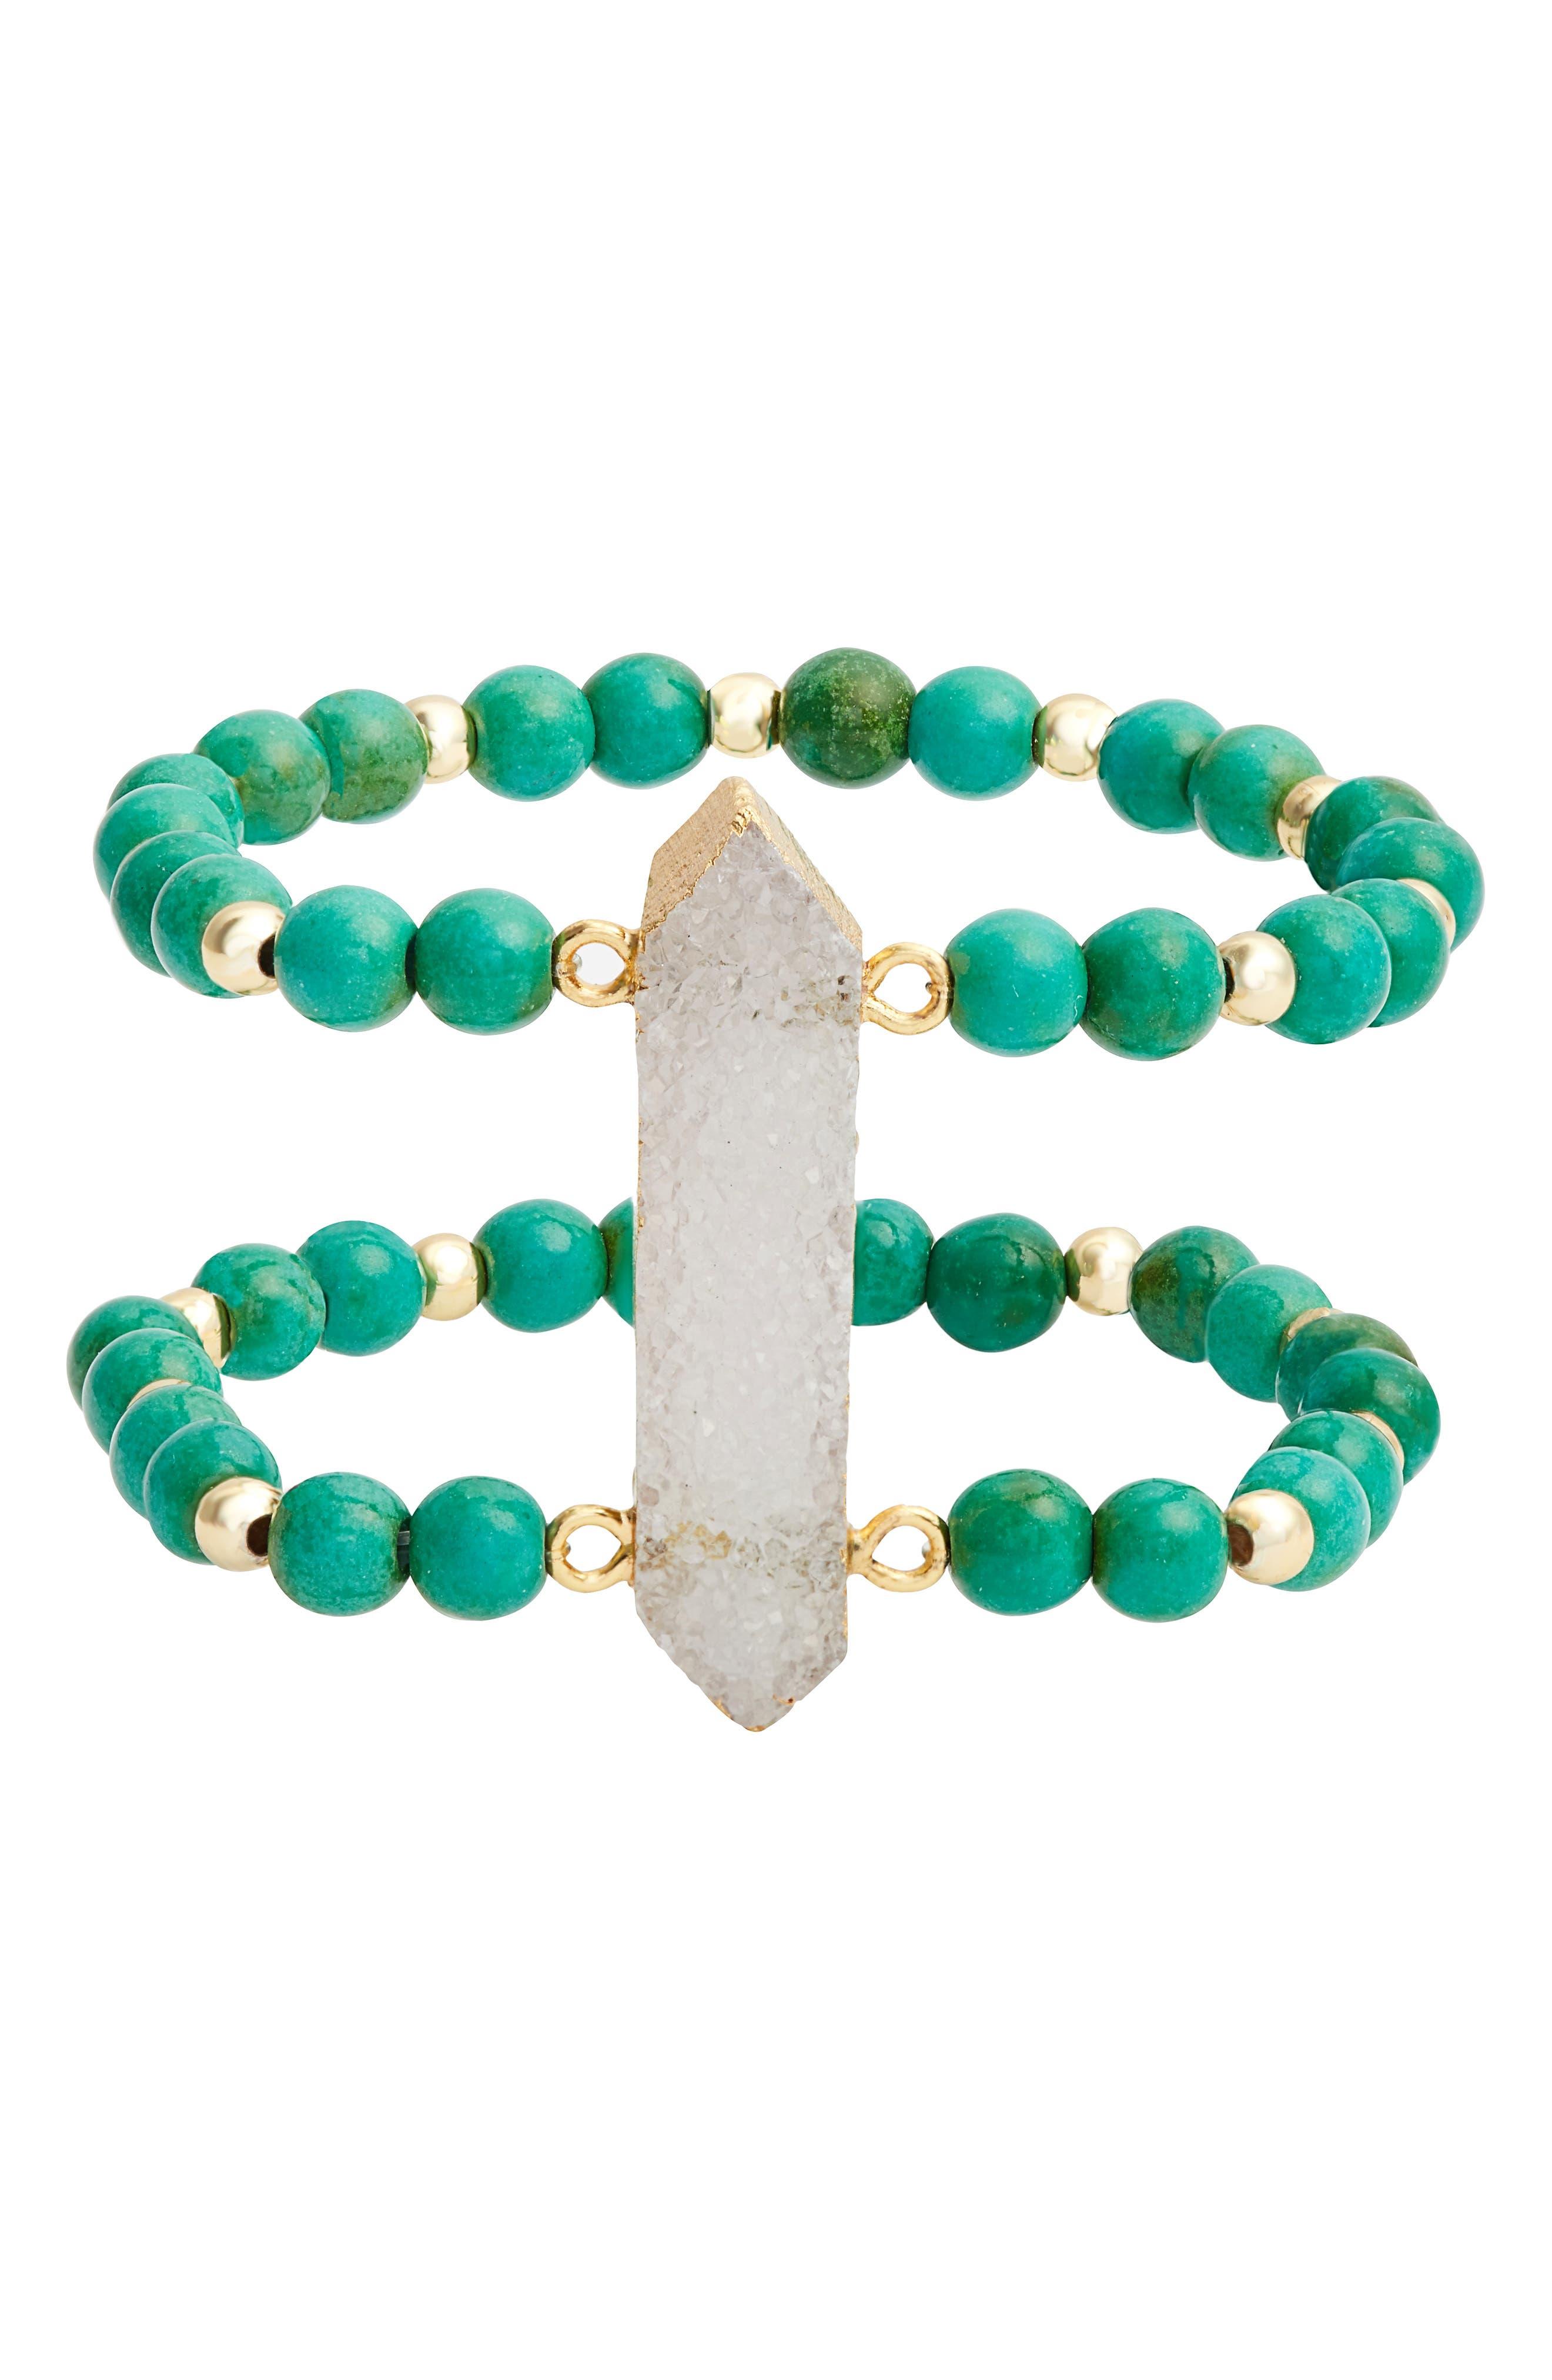 Elise M. Candice Double Stretch Bracelet